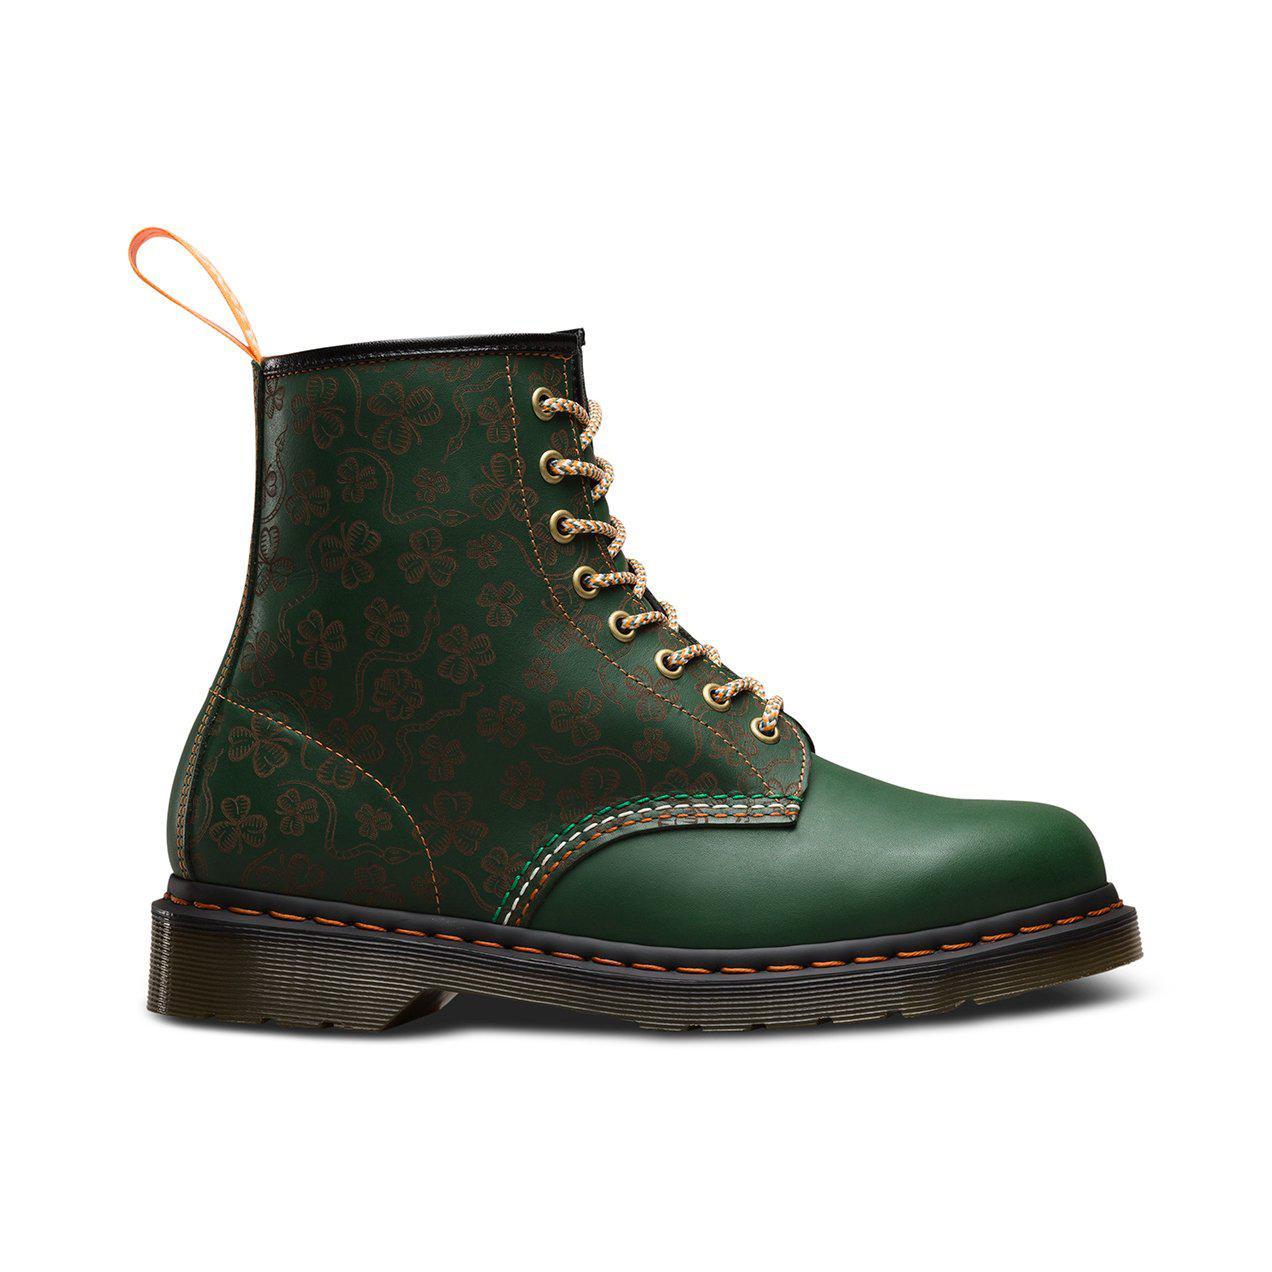 Dr. Martens Leather 1460 Shamrock Lz in